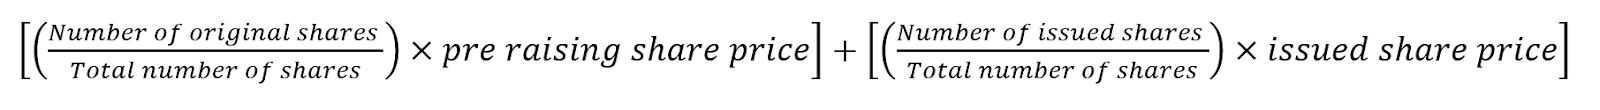 formula for wealth transfer